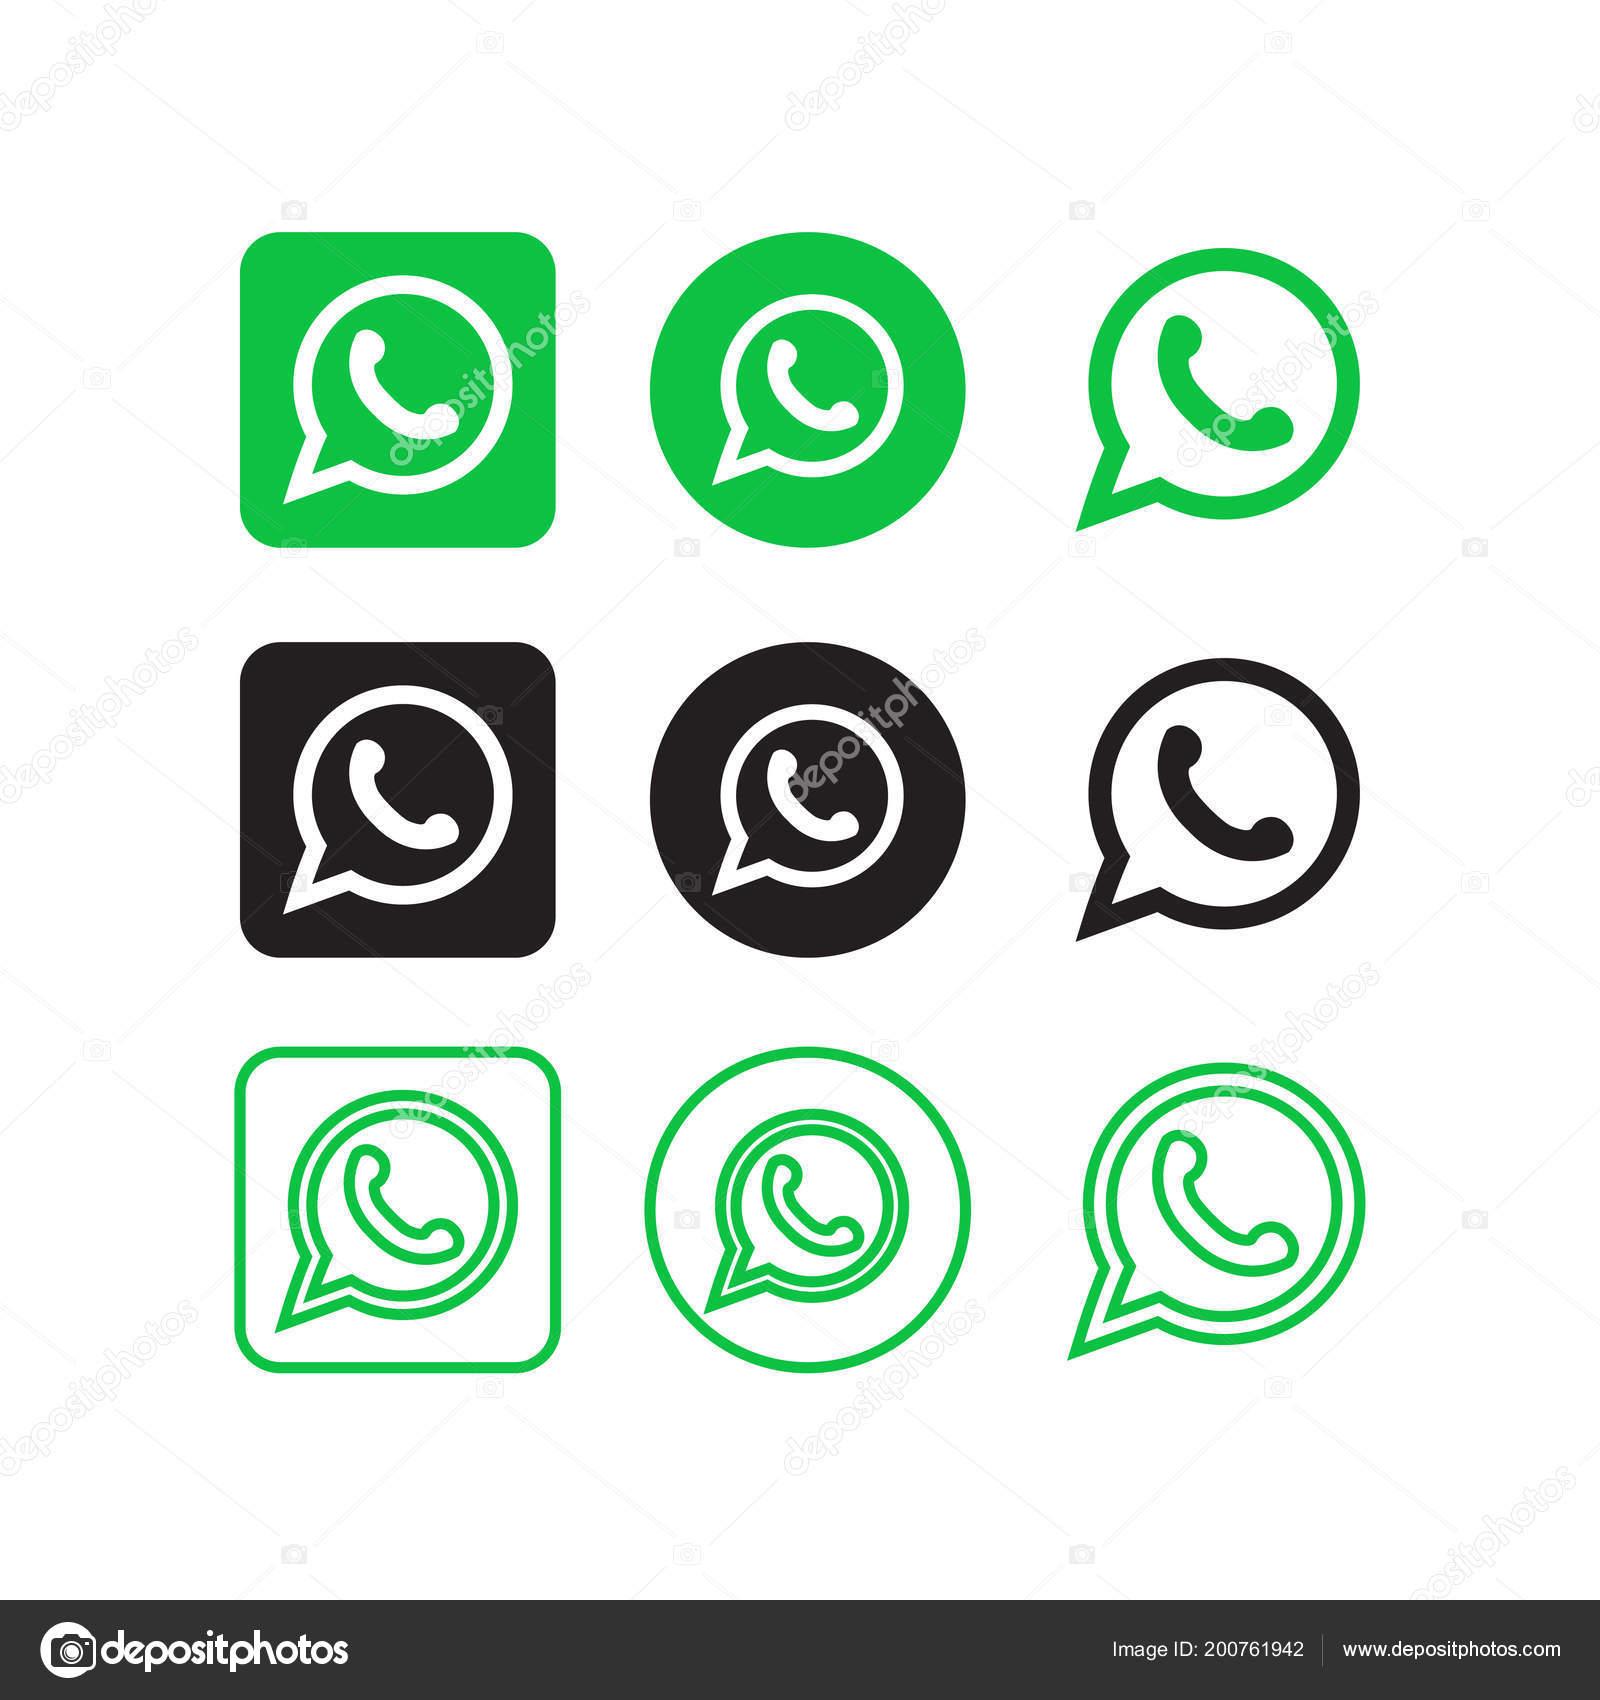 Colección Vectores Iconos Redes Sociales Whatsapp Vector De Stock